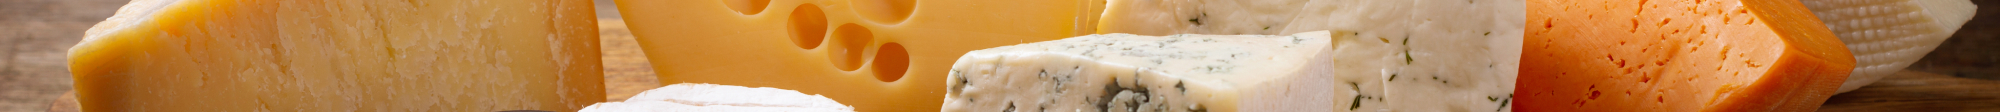 Comprar  quesos Curados gourmet online | Mixtura Gourmet